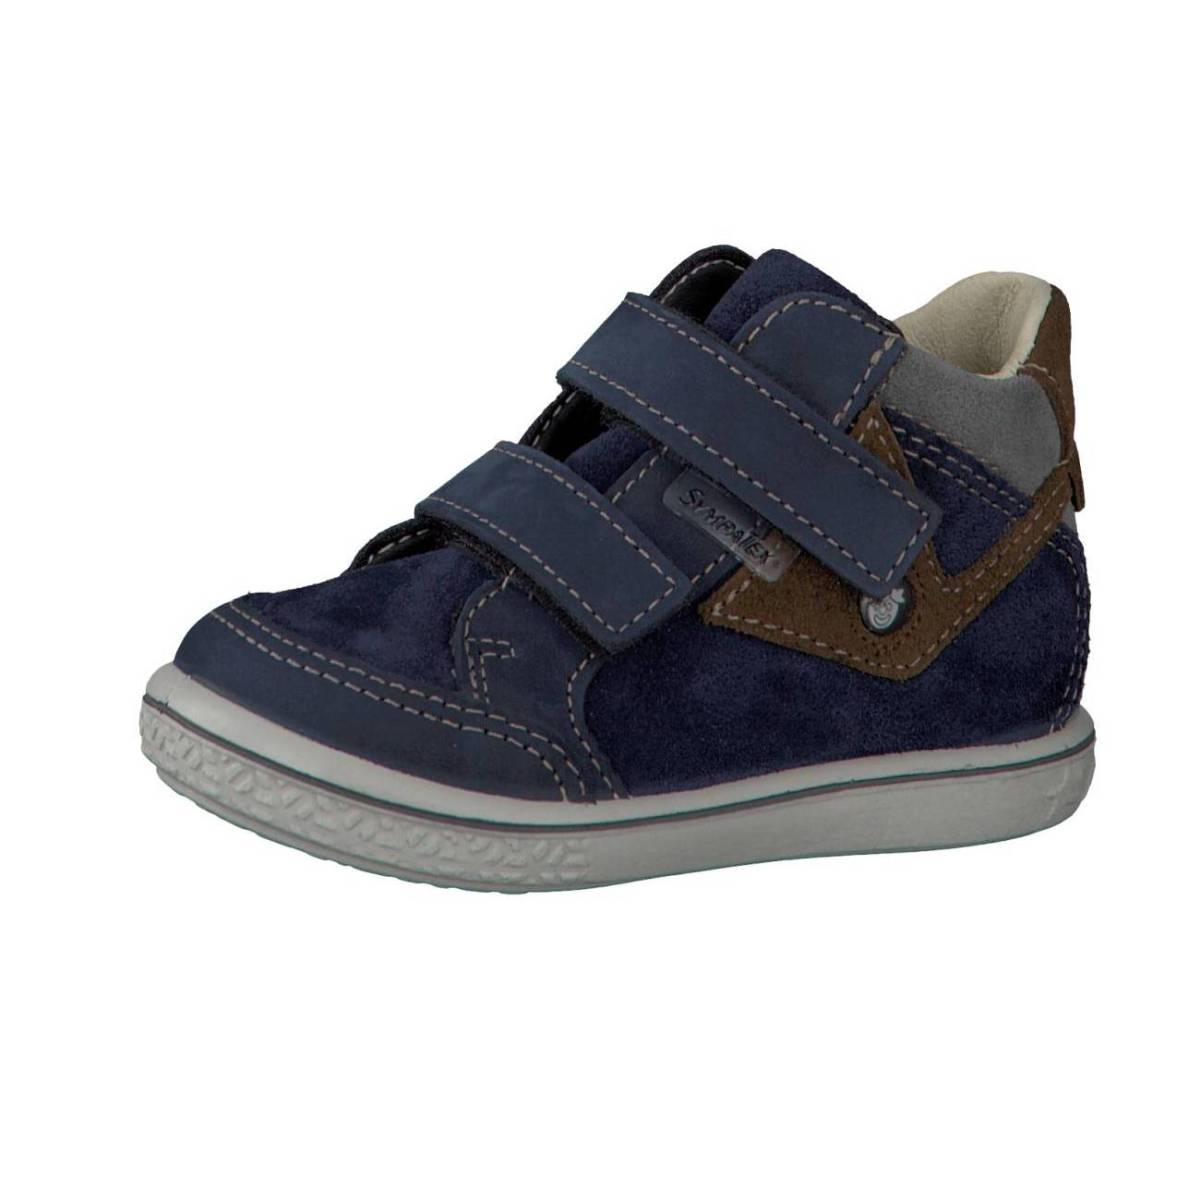 Ricosta Pepino Kimo blau braun nautic hazel Schuhe Jungen Mädchen Kinder